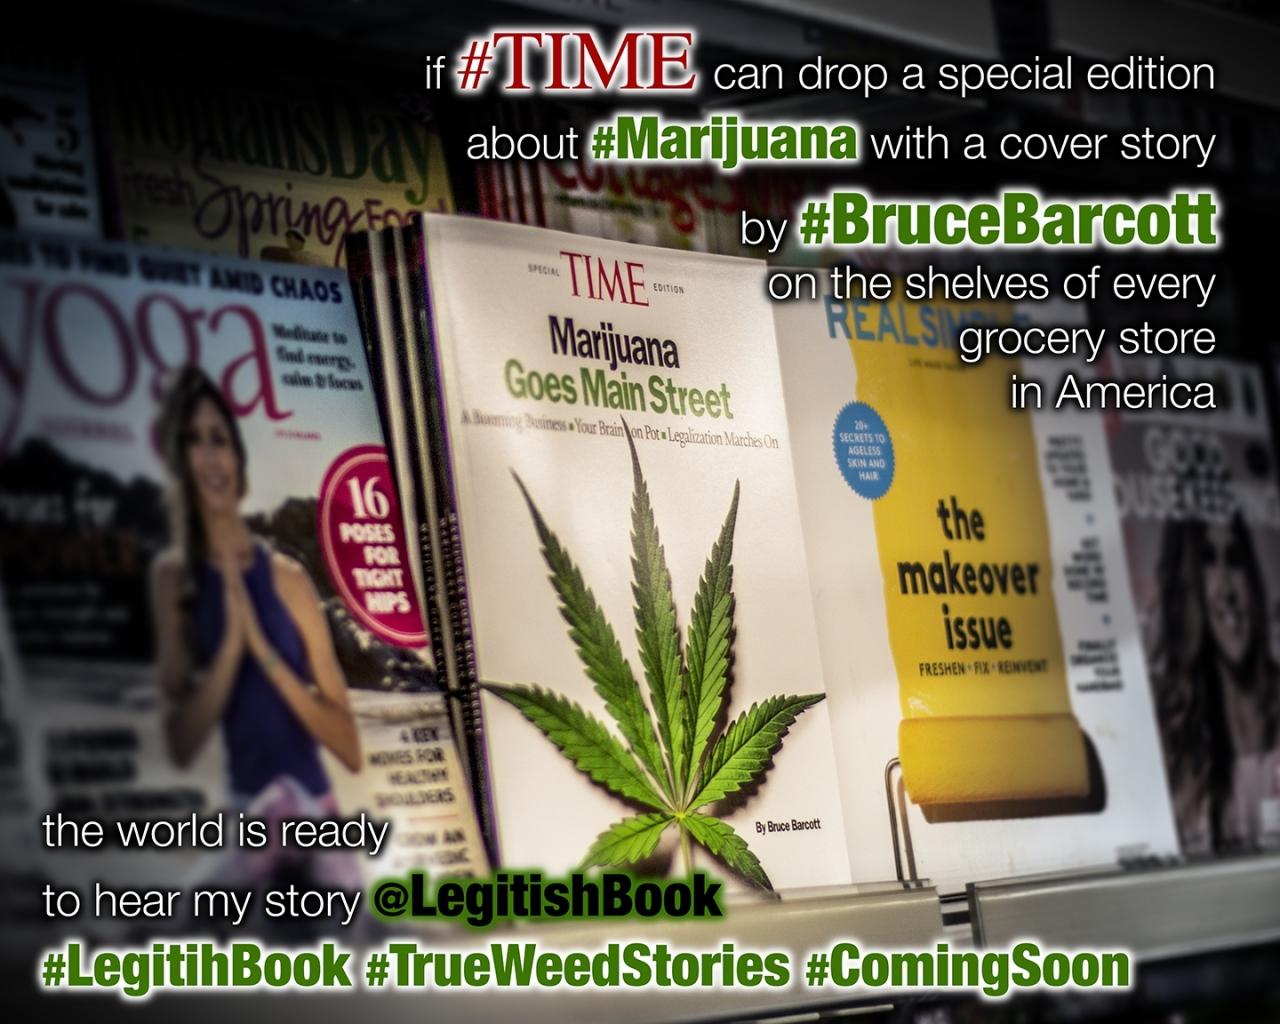 TIMES magazine cover IG.jpg